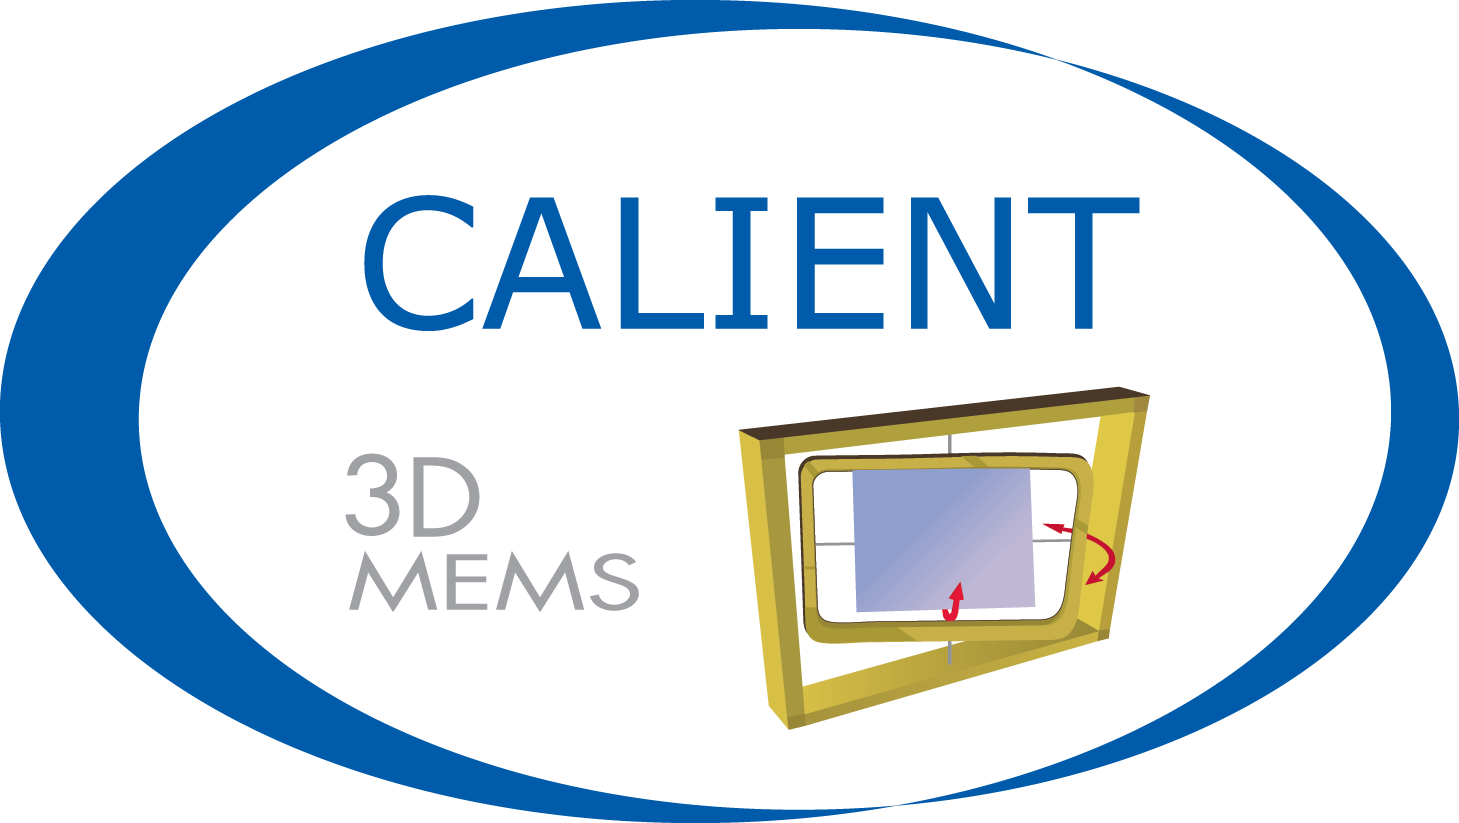 CALIENT Technologies